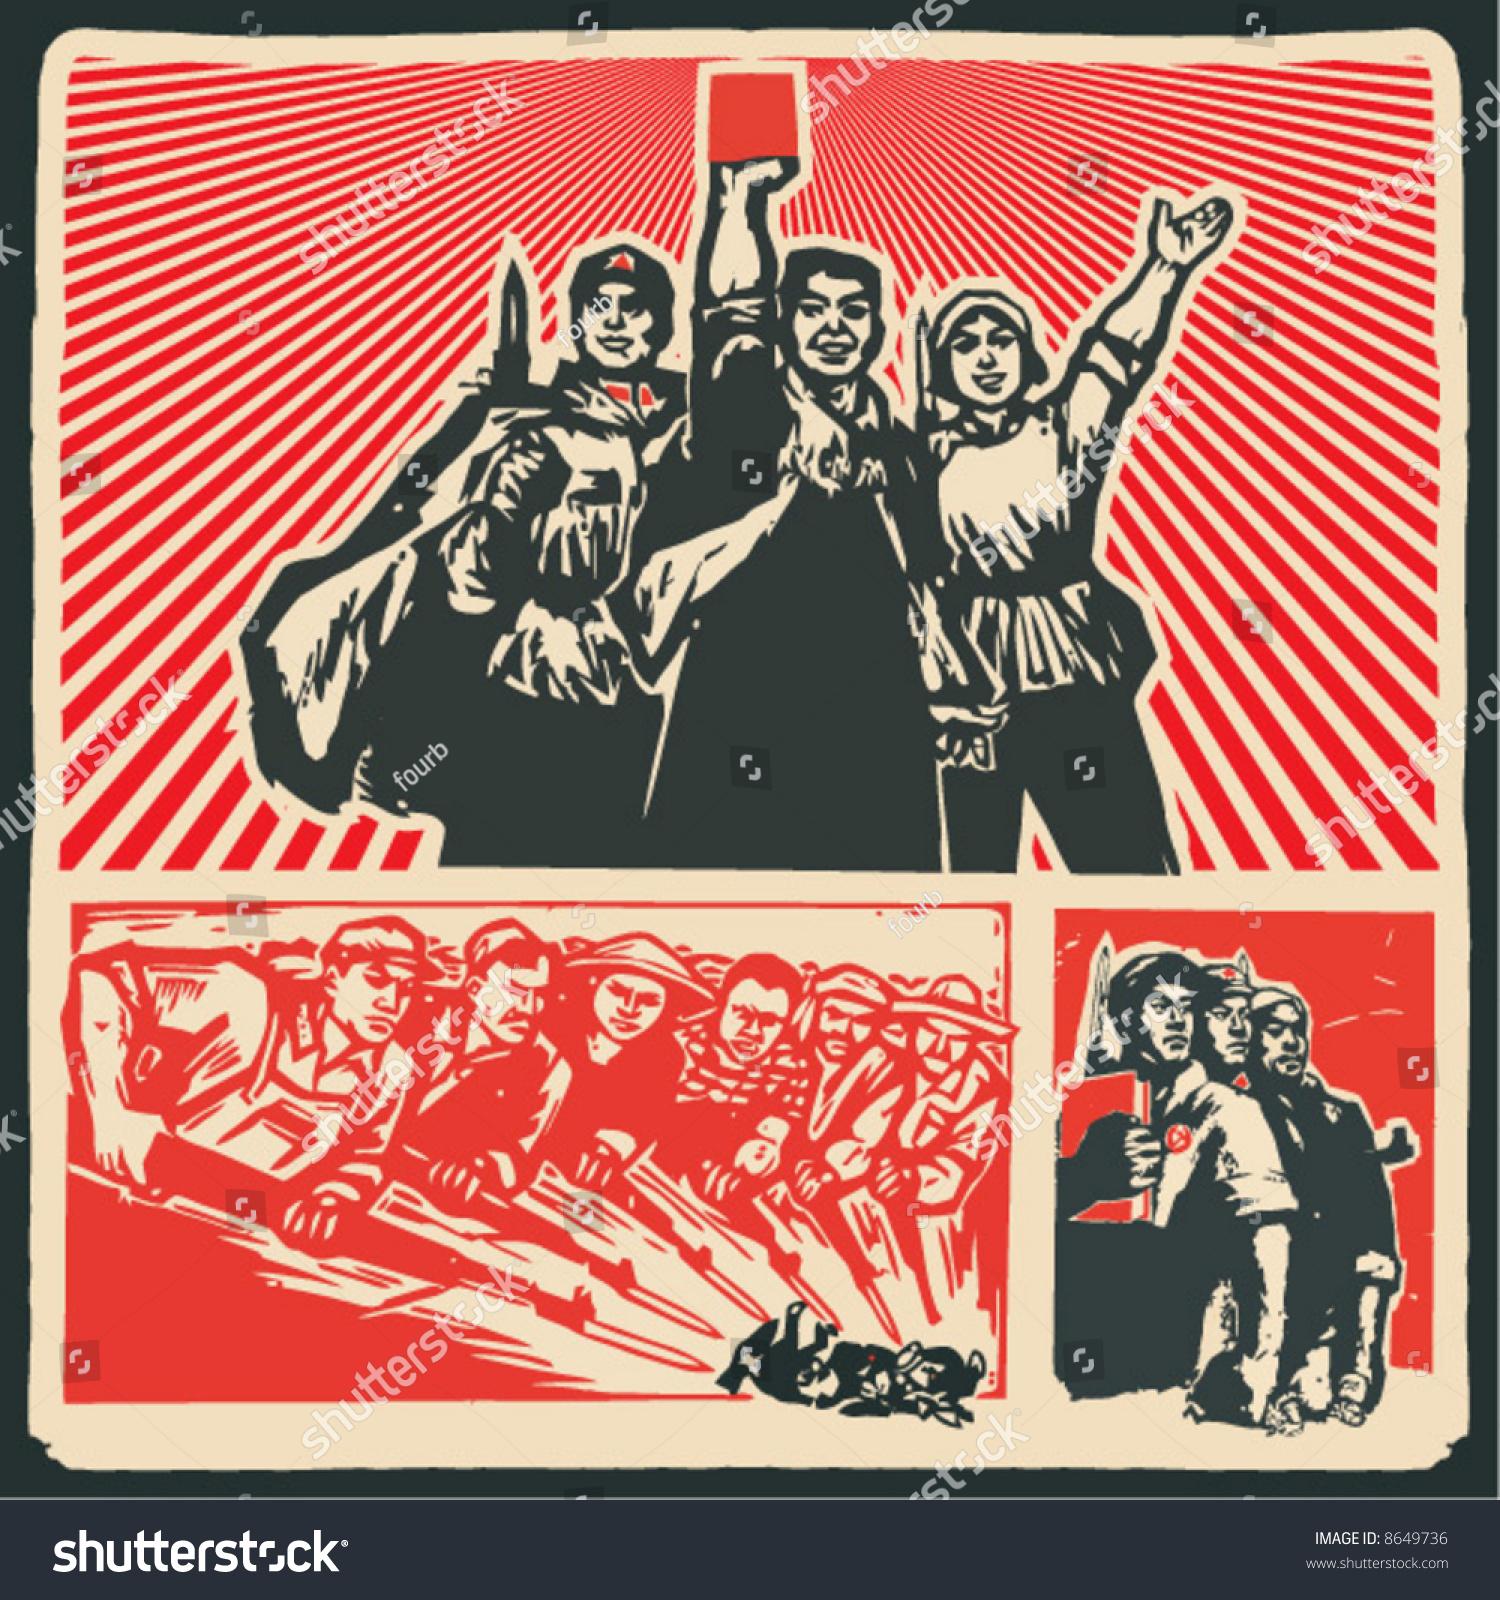 Old Communism Poster Stock Vector 8649736 - Shutterstock